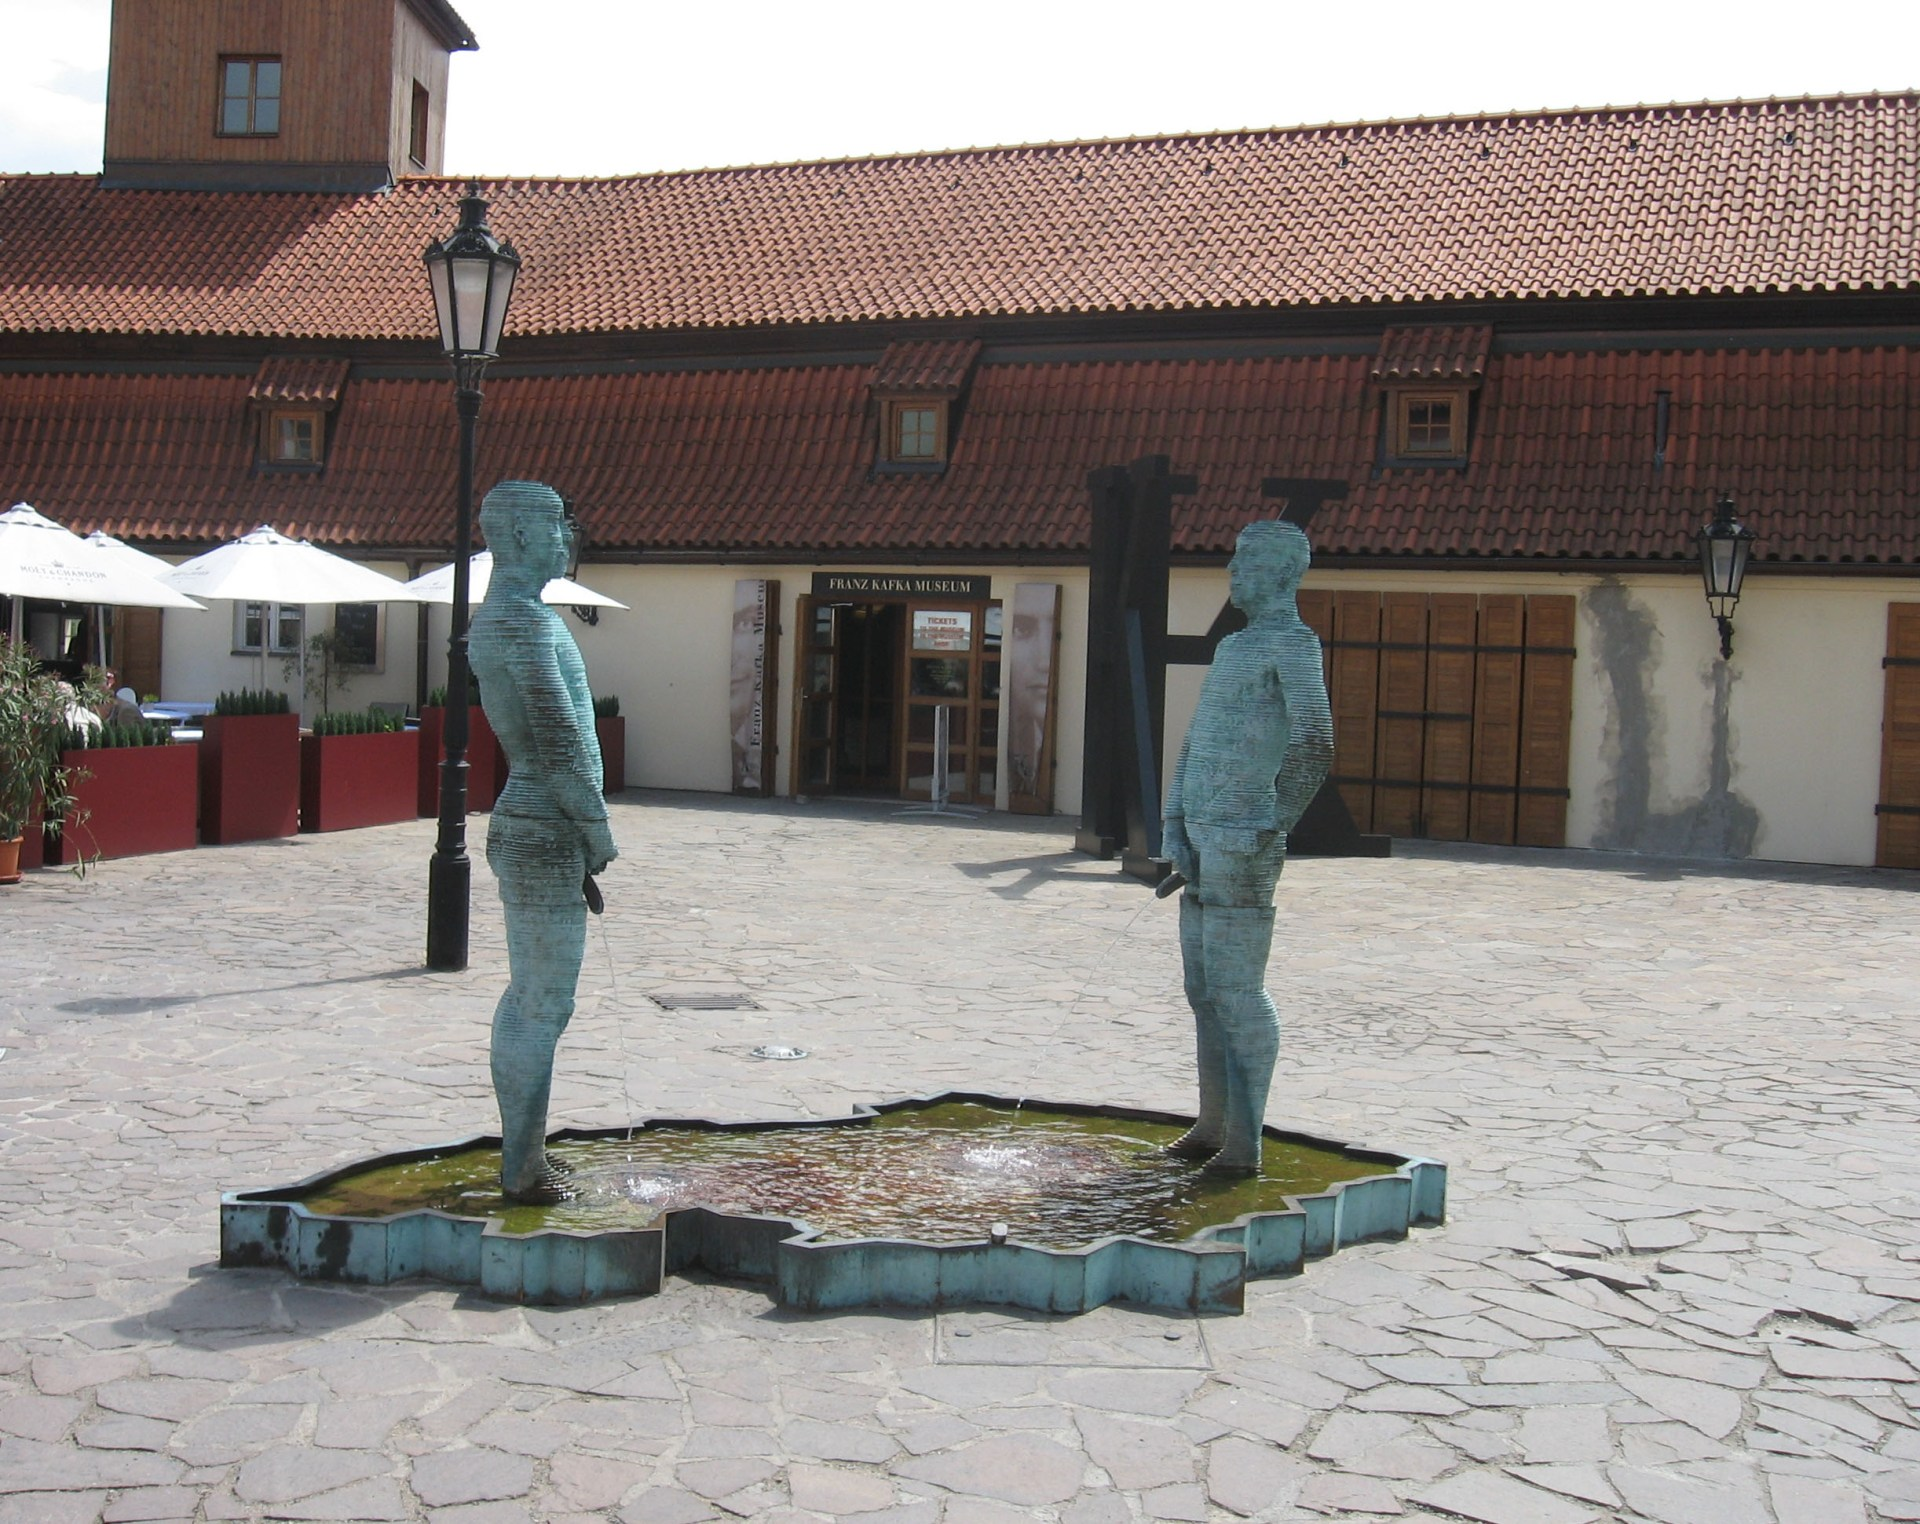 The 10 most bizarre public sculptures